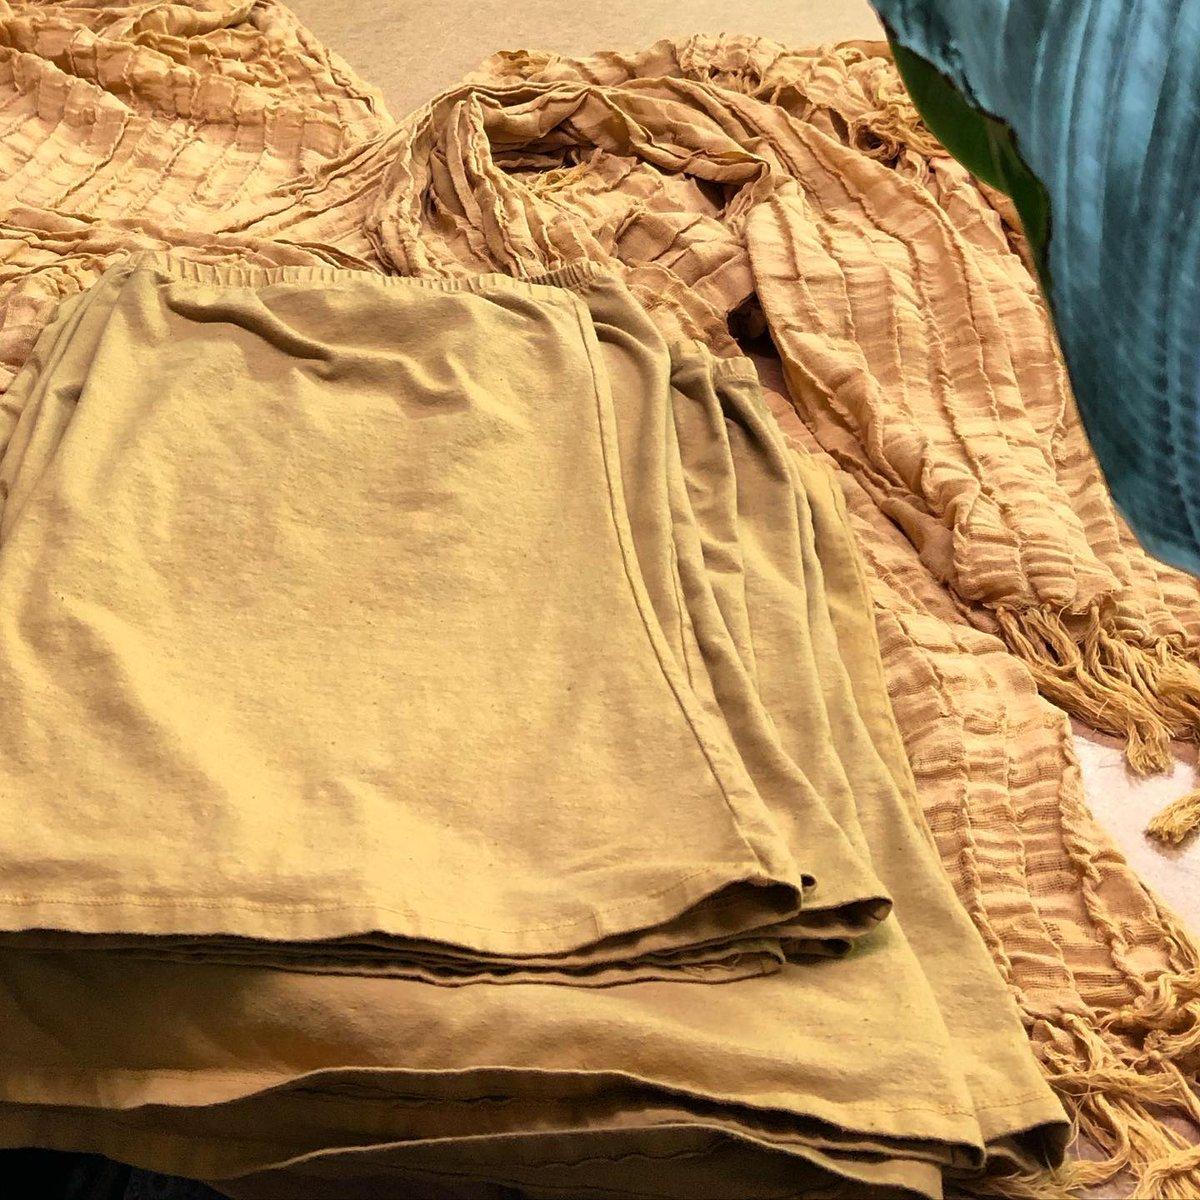 Fresh dyed Tube Tops & Raw Cotton Scarves in MARYGOLD #golden #ecofashion #organiccotton #workingweekend #handdyed #naturalfibers #rawcotton #hemp #organiccottonpic.twitter.com/RAhyg7cgWU